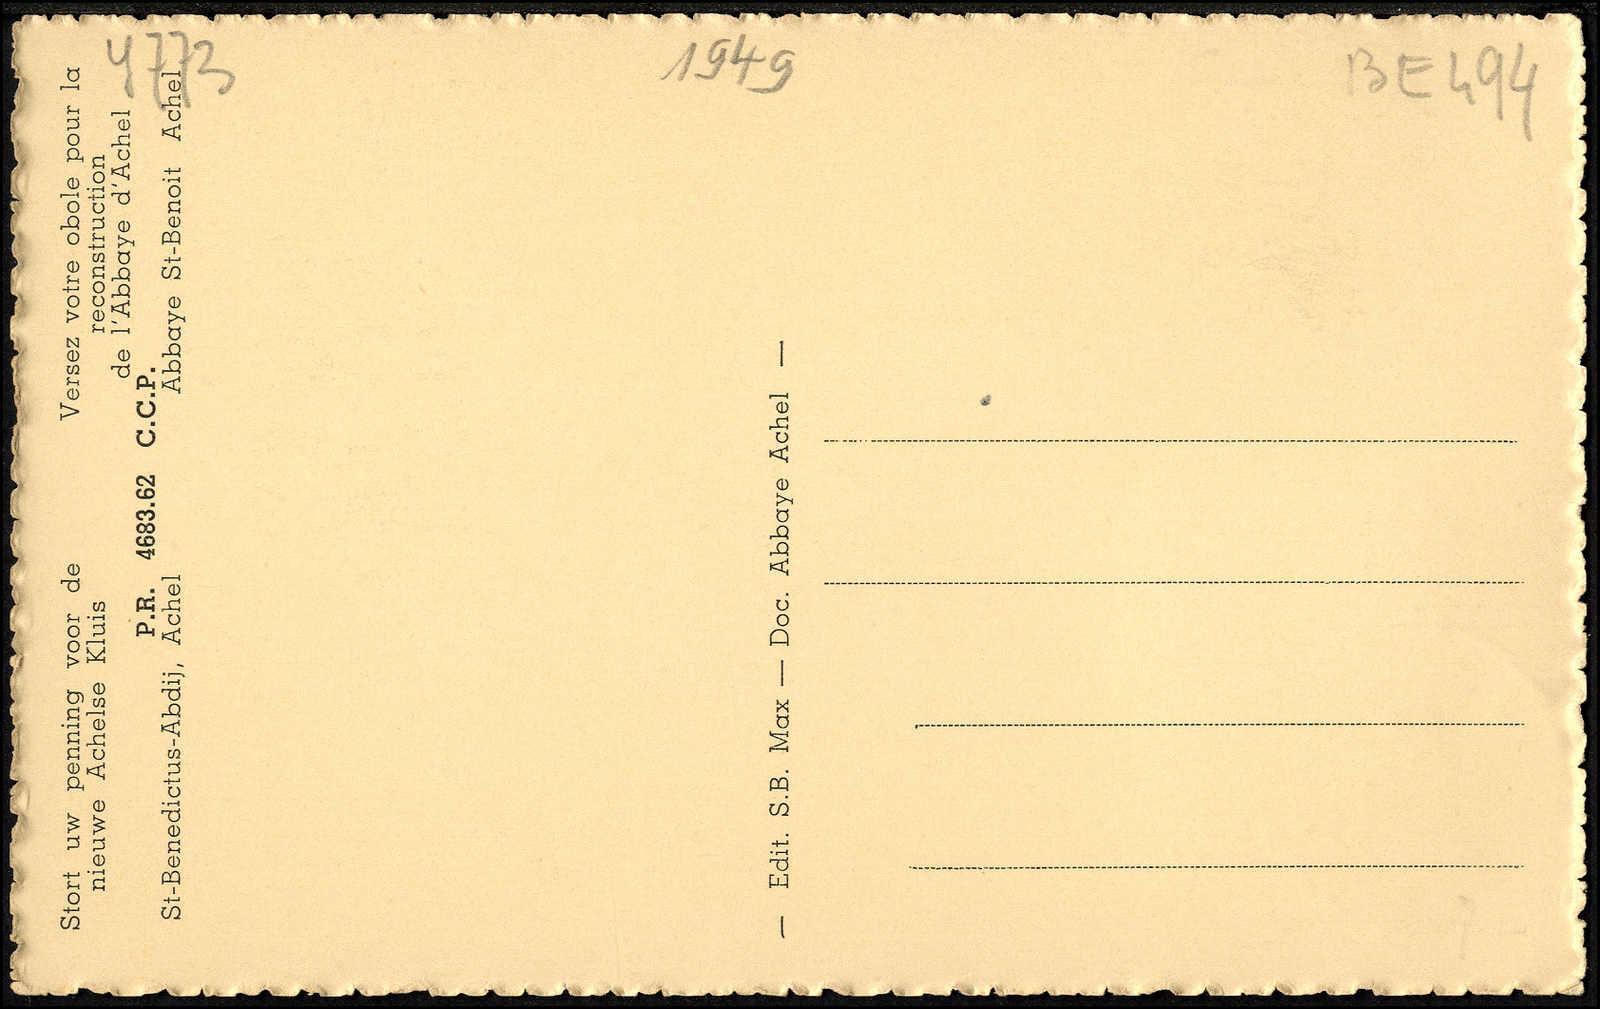 Lot 977 - europa belgien -  Rolli Auctions Auction #68 Day 1